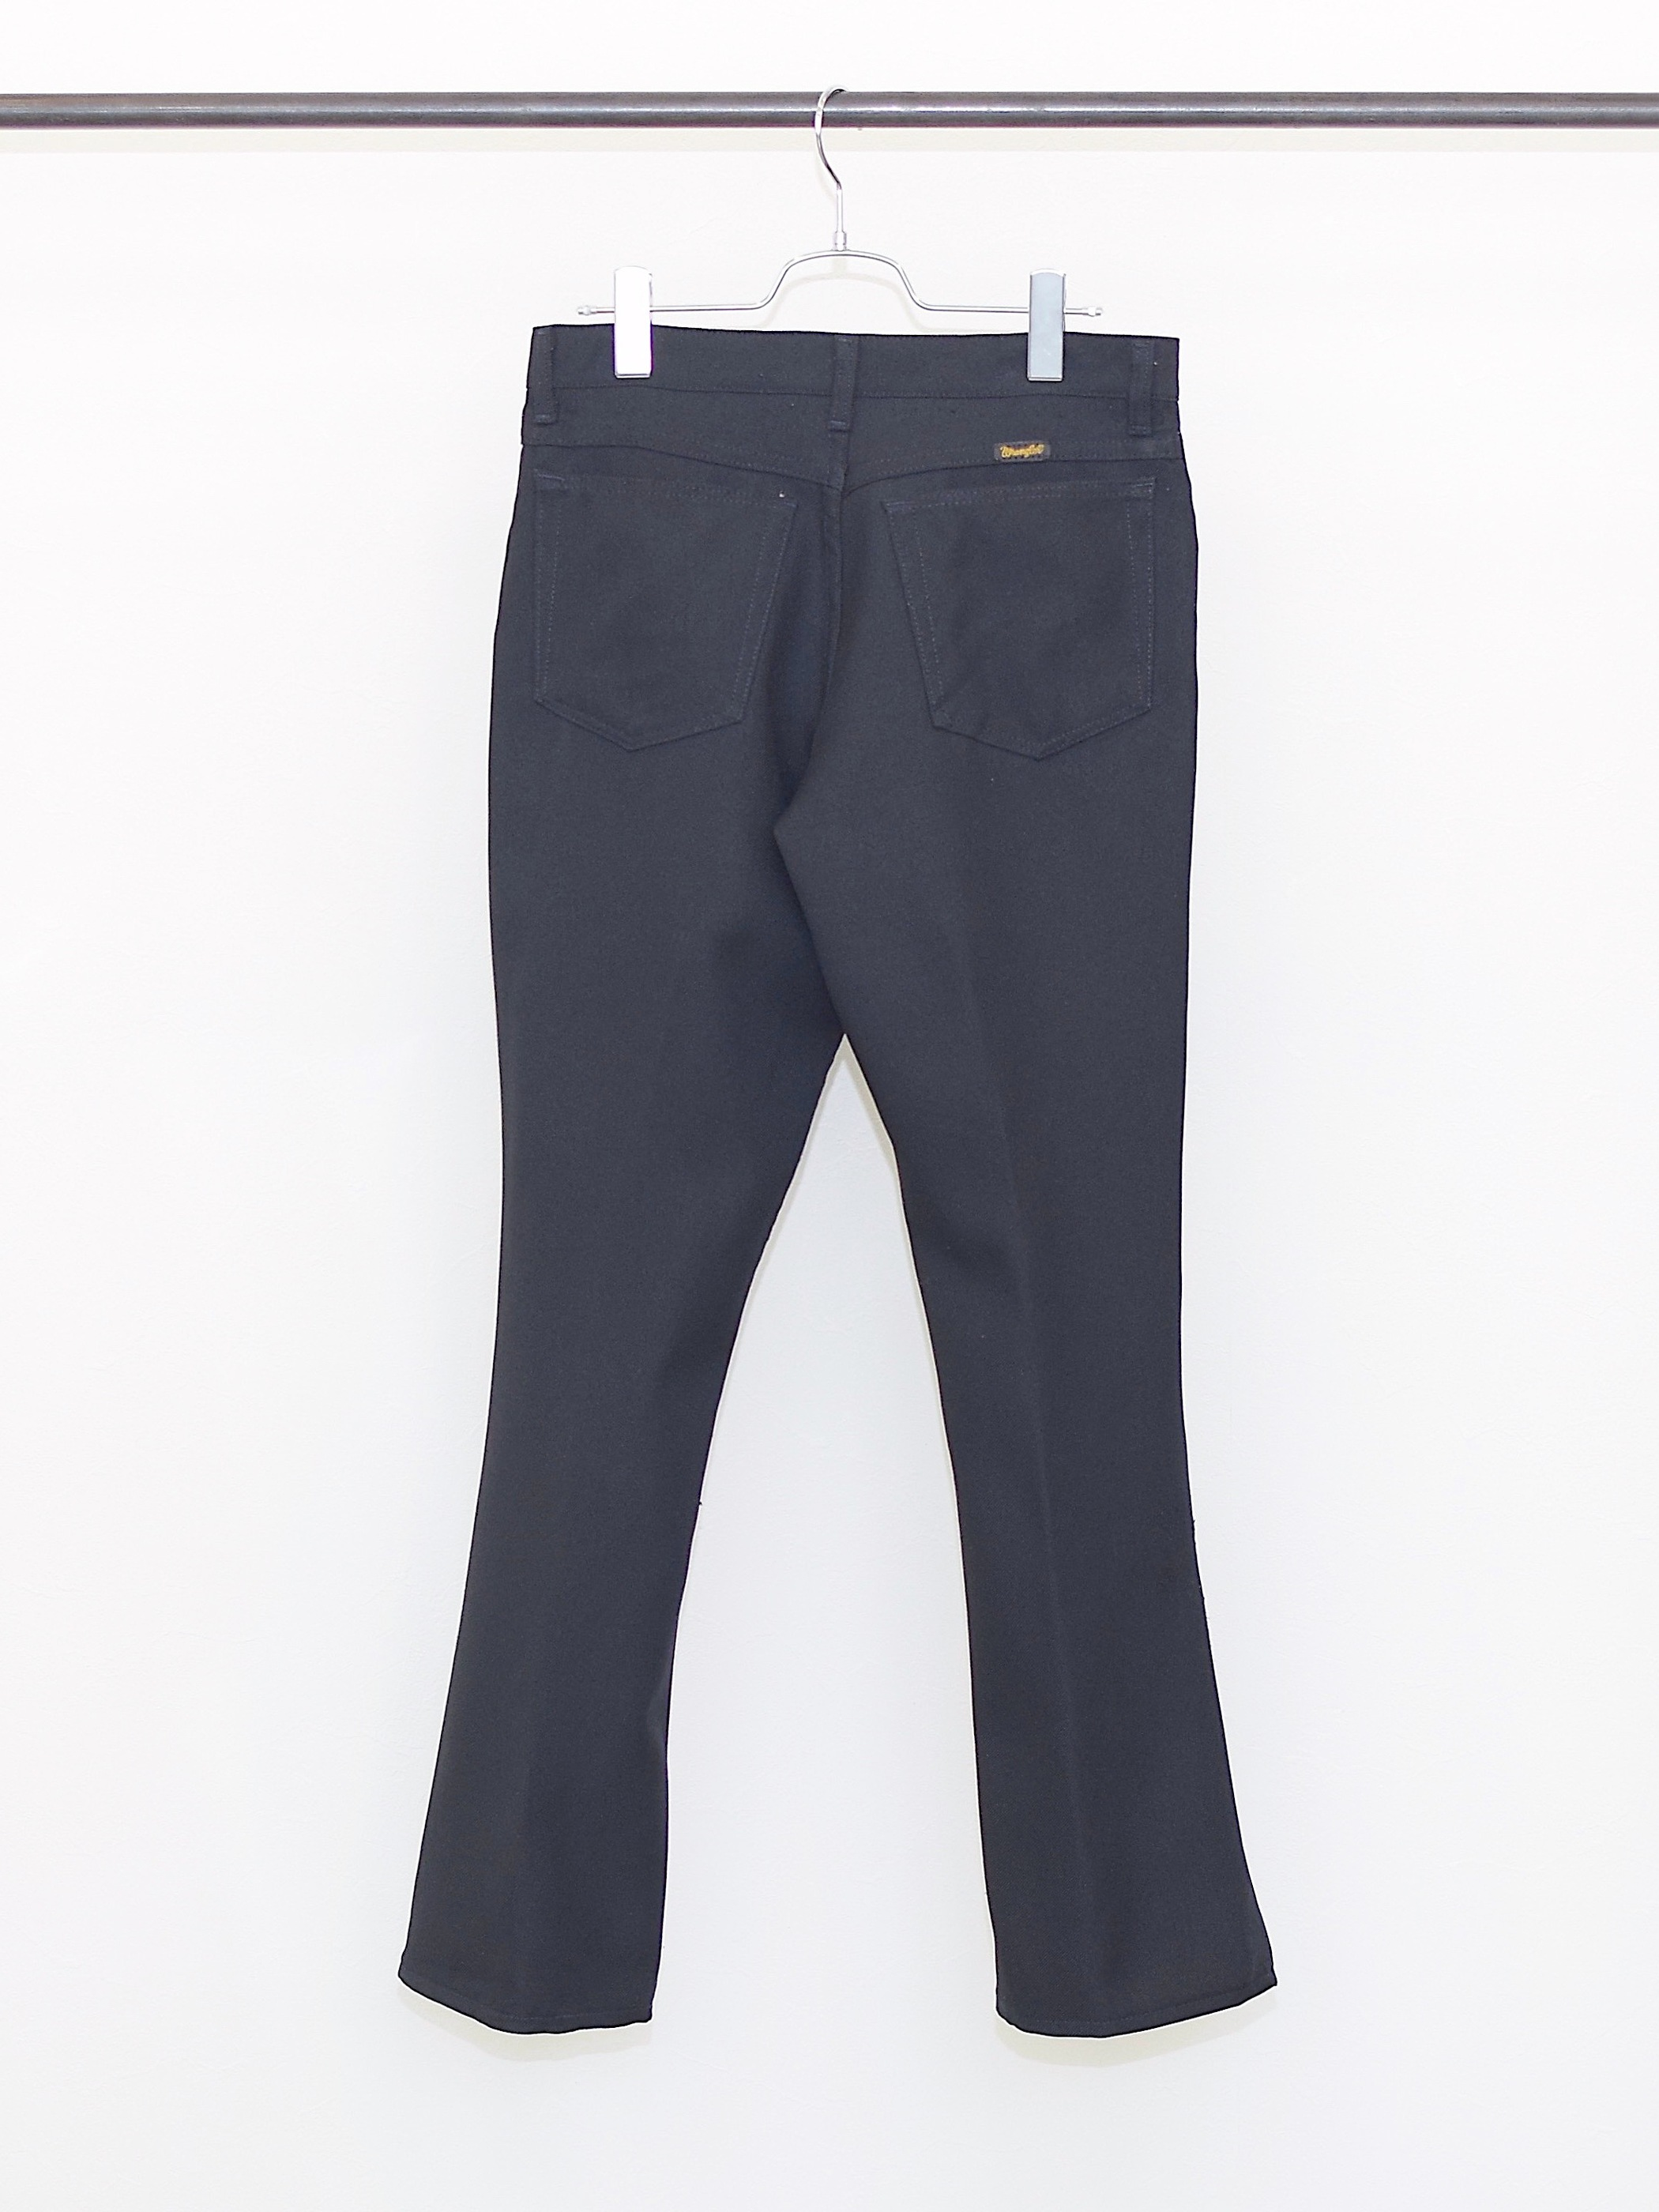 Vintage【Wrangler】Wrancher Dress Jeans